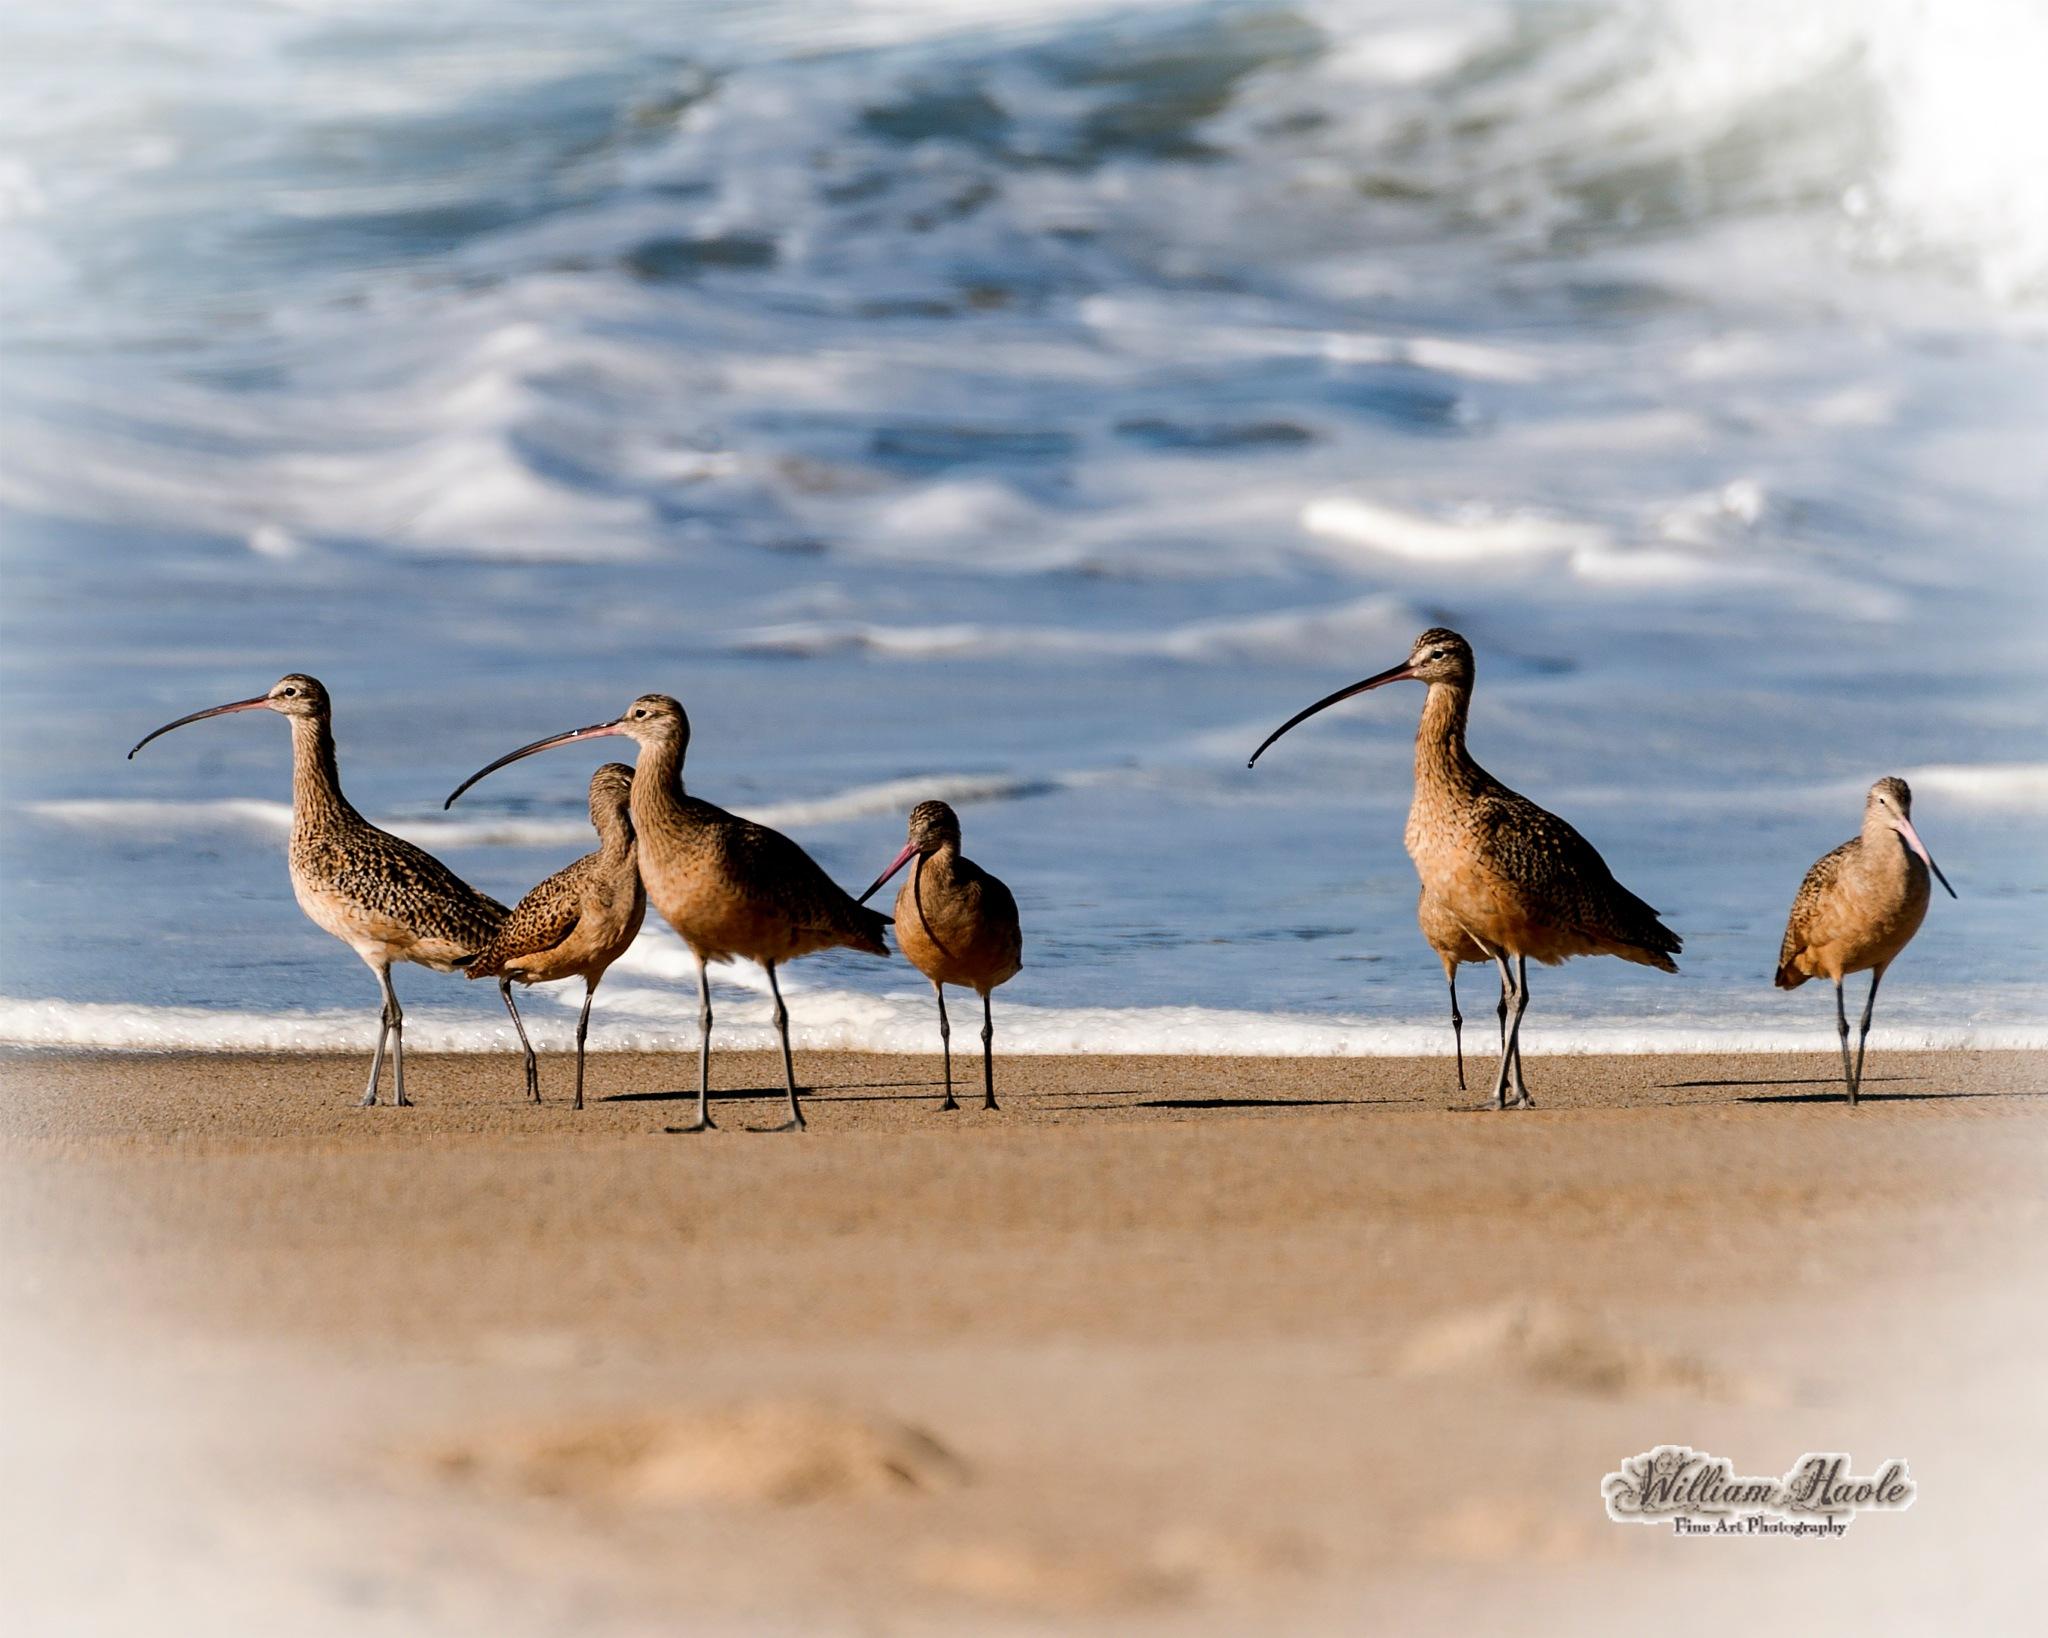 Long Billed Curlew by Bill Havle